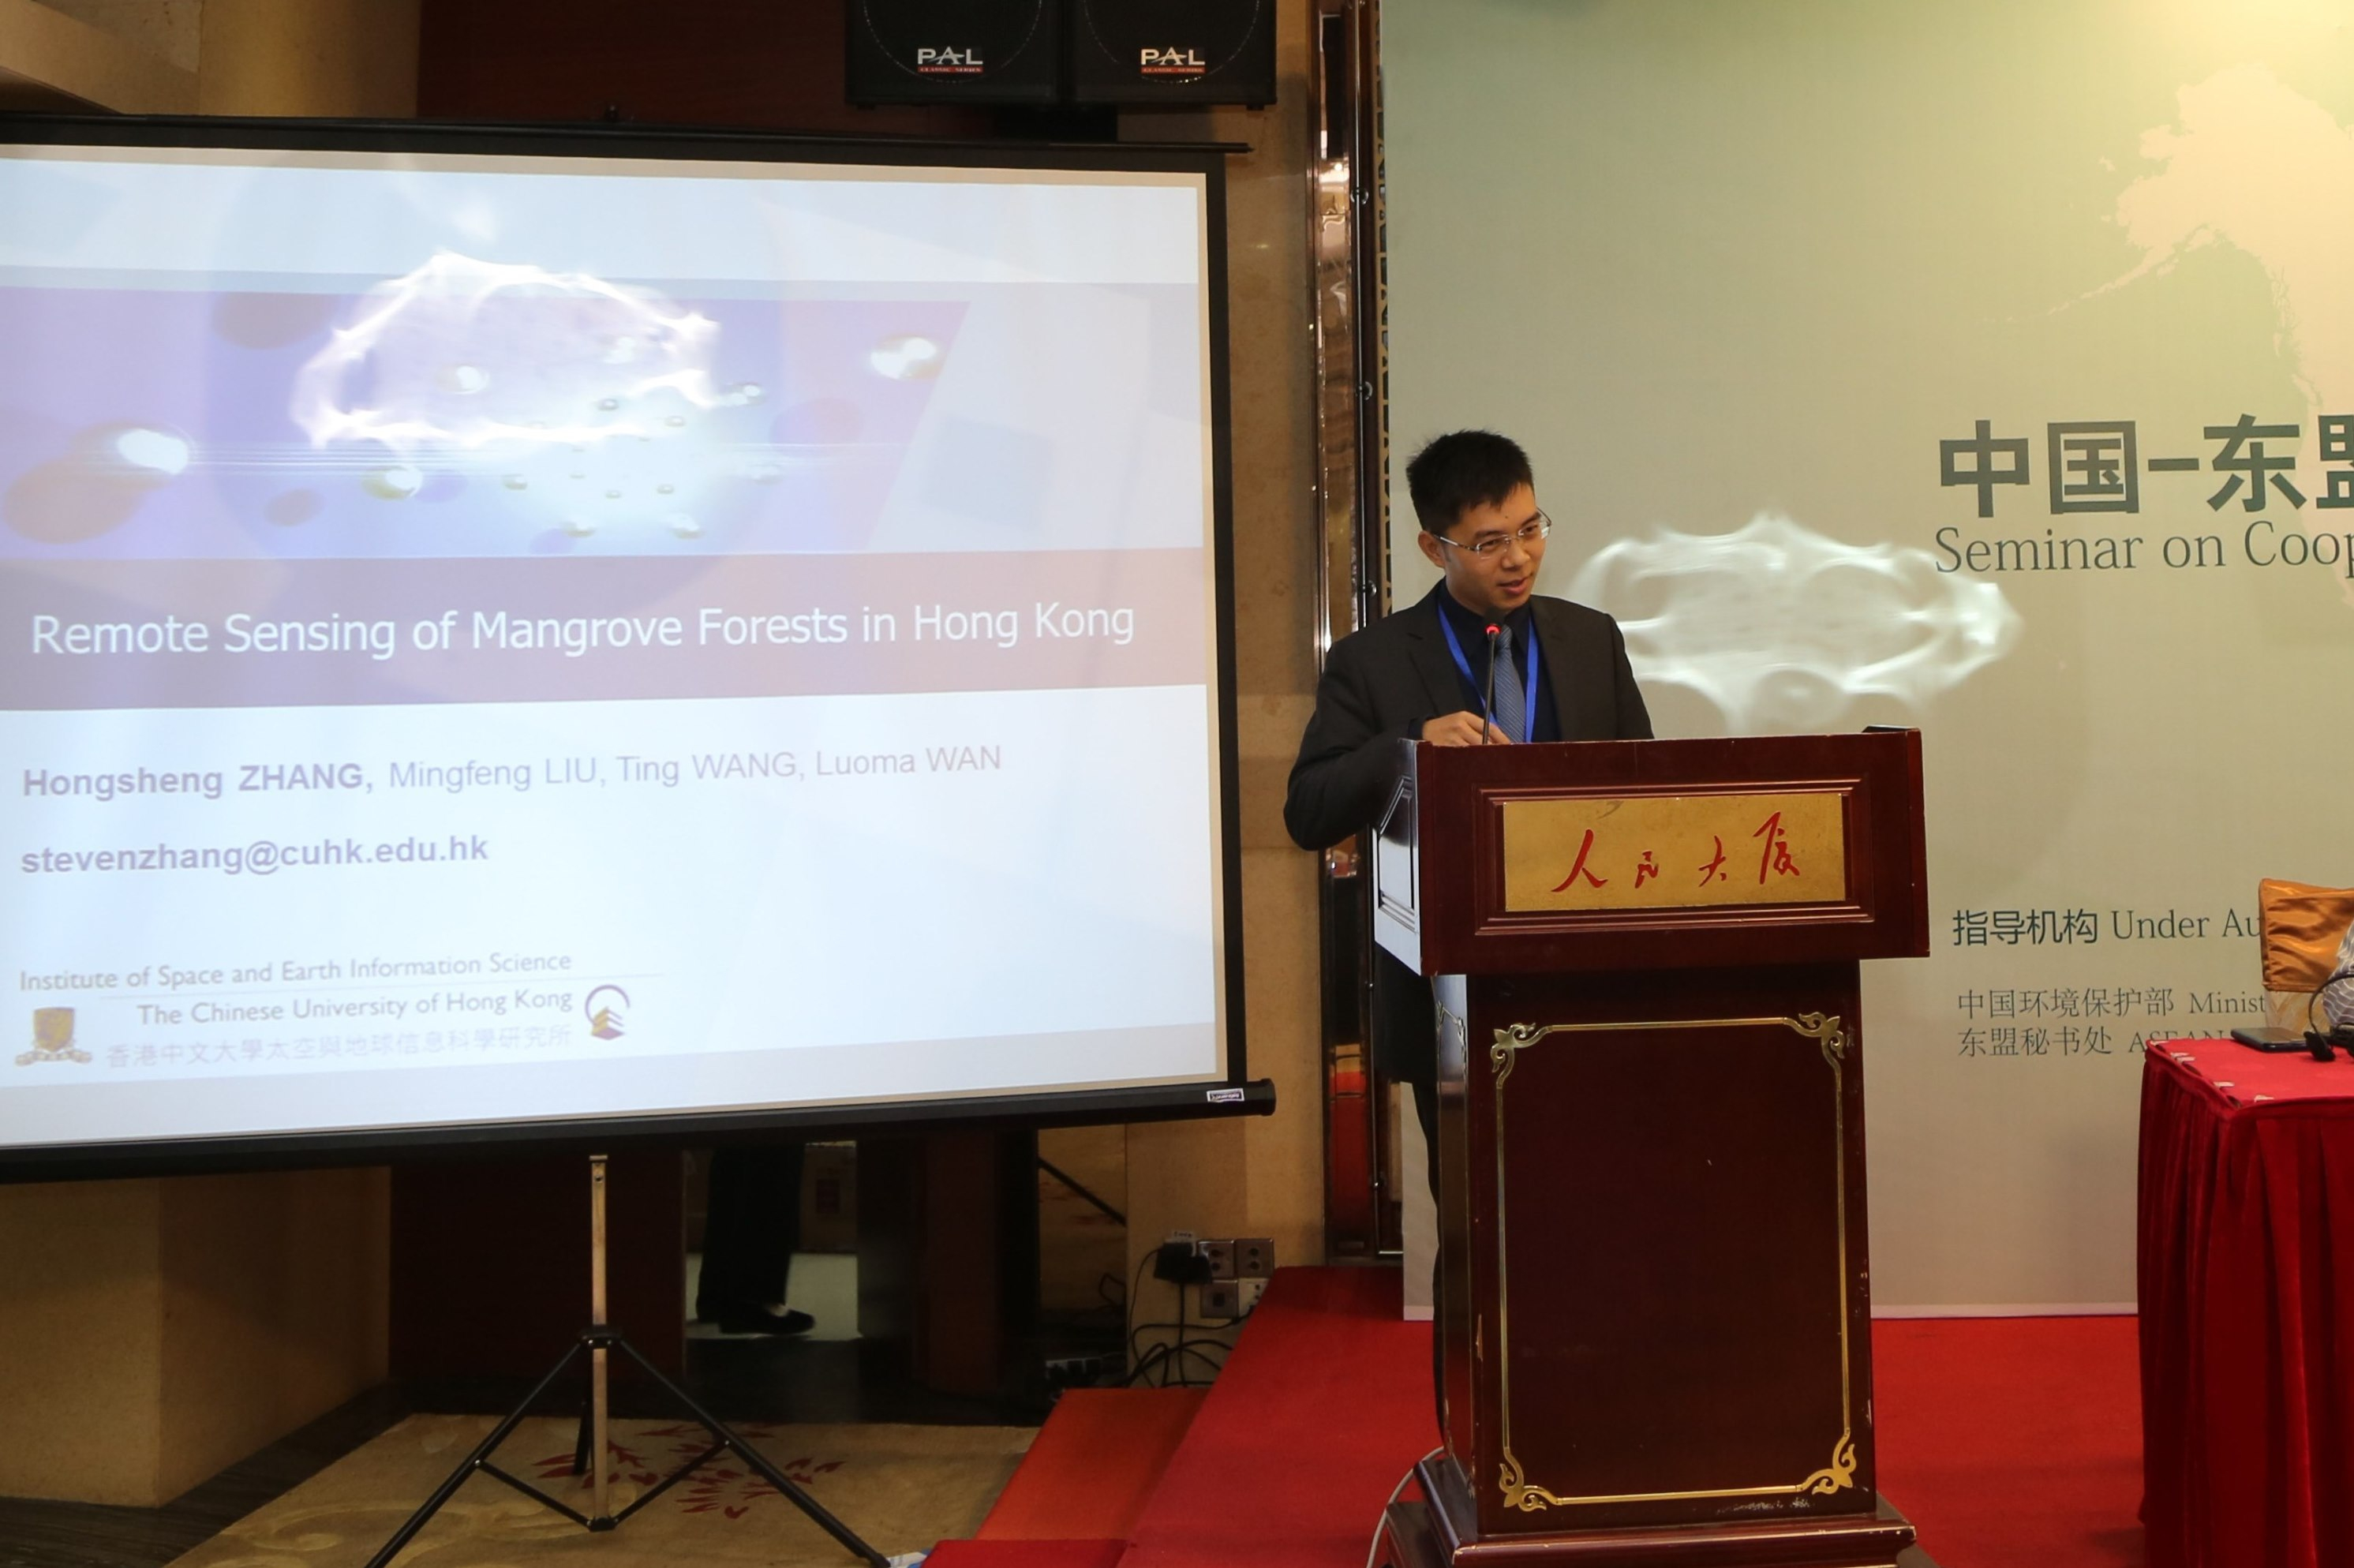 Dr. Zhang Hongsheng gives a presentation on 'Remote Sensing of Mangrove Forests in Hong Kong'.